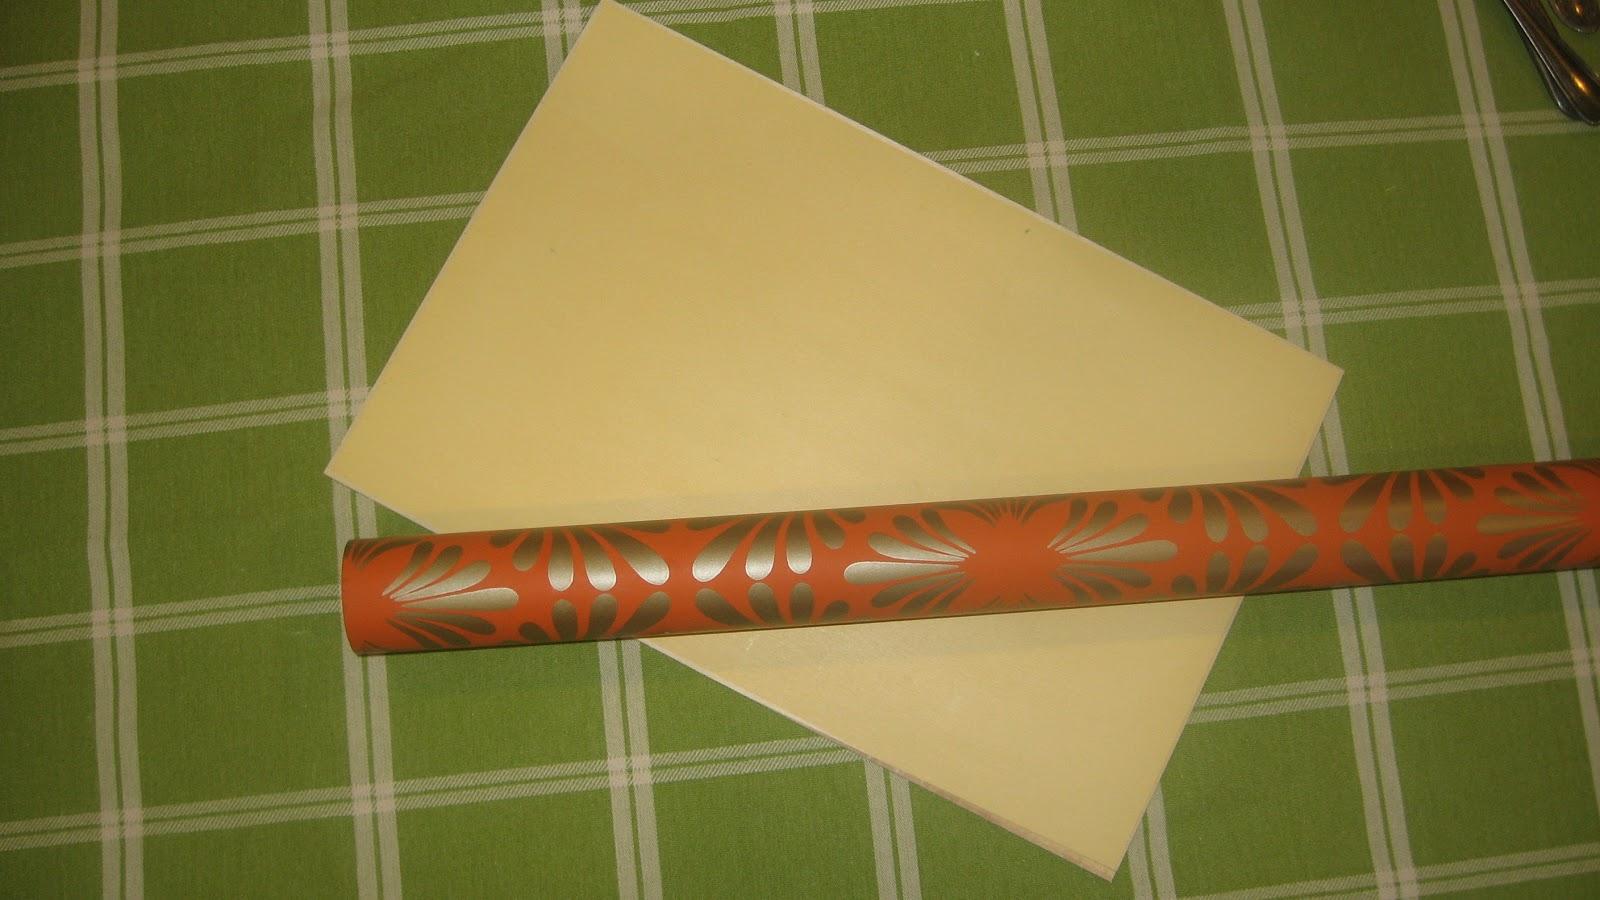 http://1.bp.blogspot.com/_ElgC8_vQlz0/TNs7ChYnRWI/AAAAAAAAJME/3031A-sKkS4/s1600/lamp+shade+036.jpg